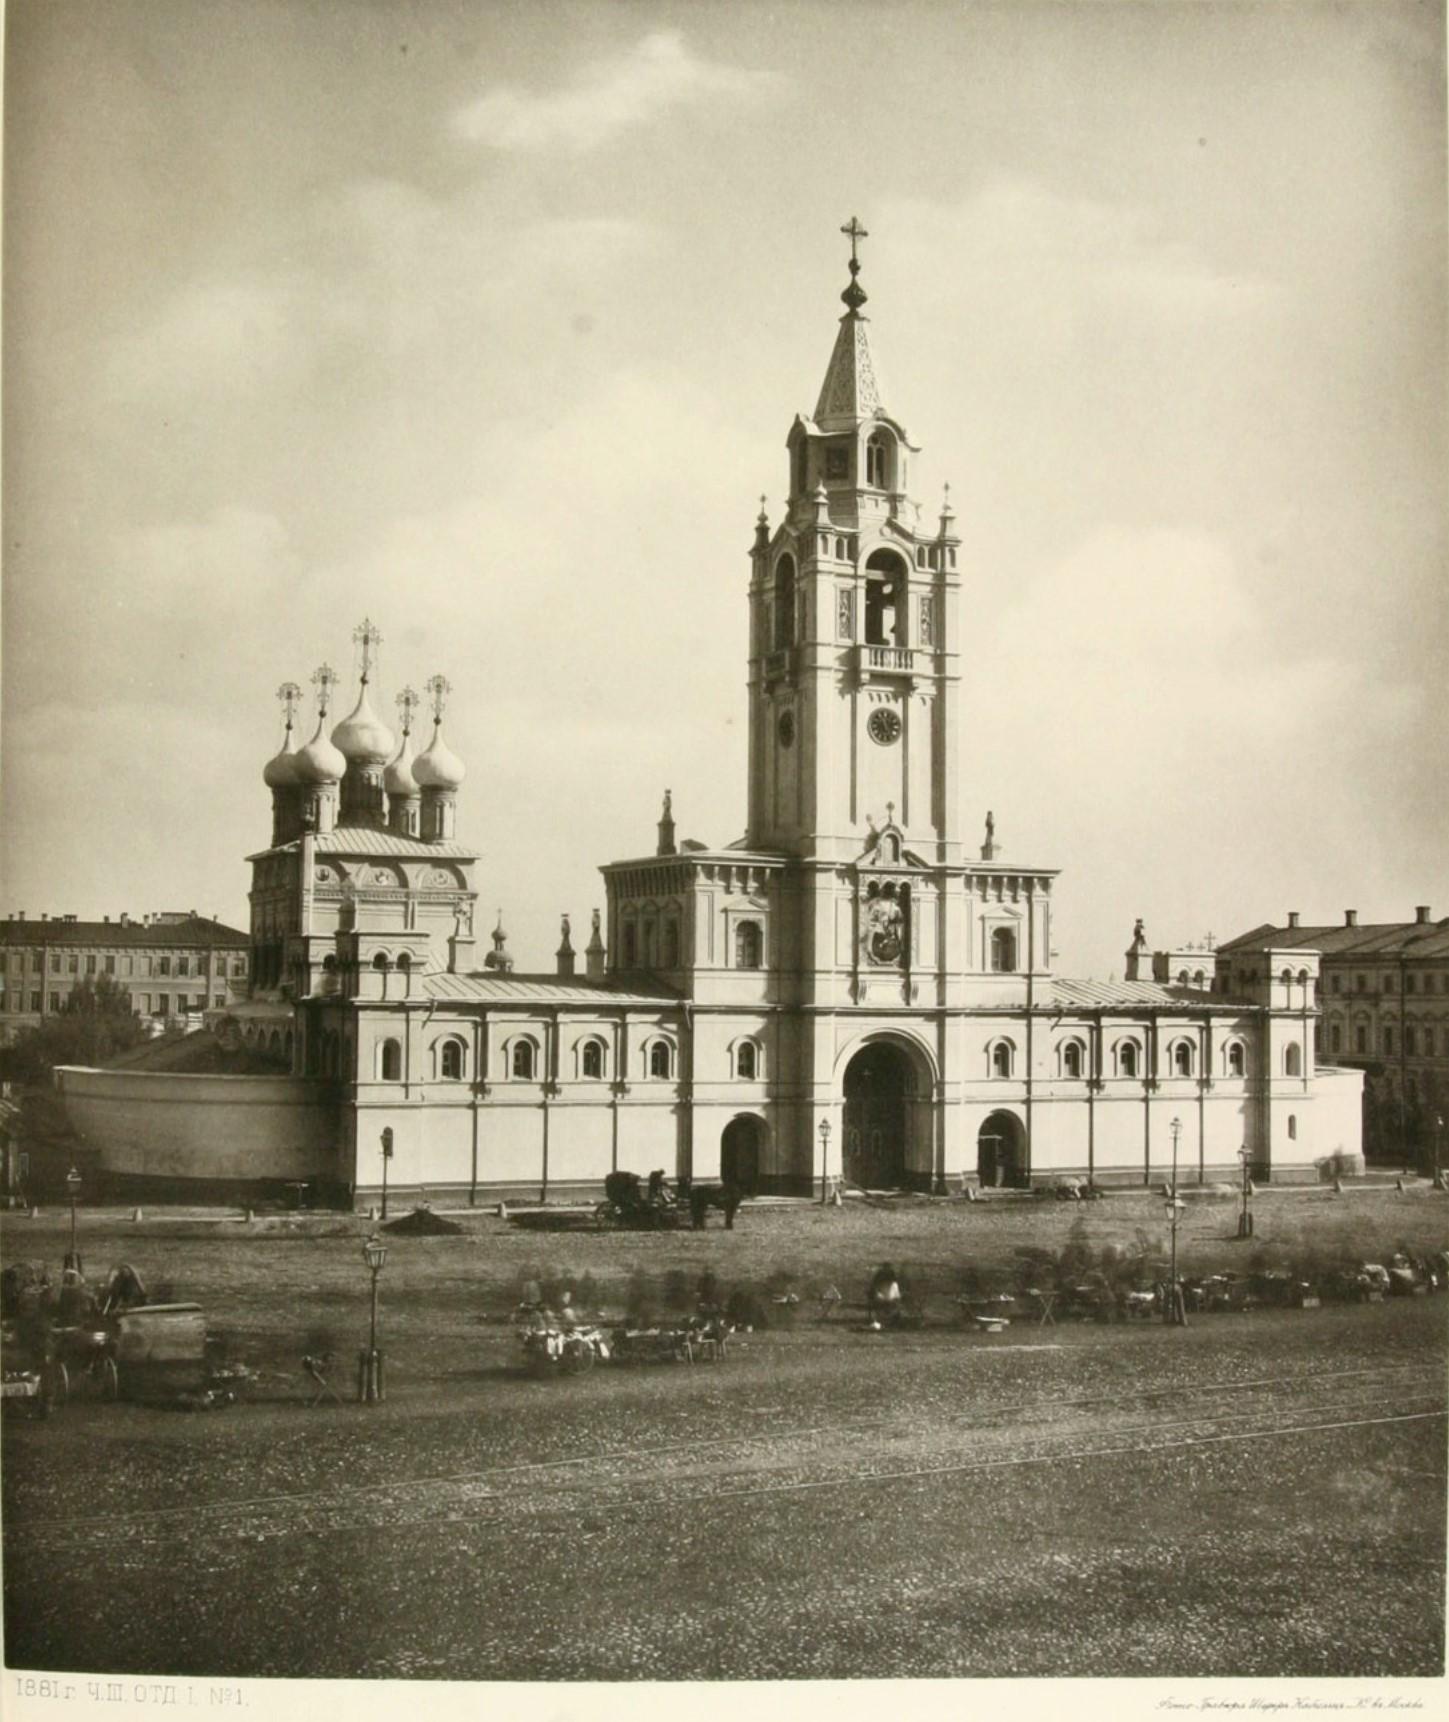 https://upload.wikimedia.org/wikipedia/commons/7/79/Moscow%2C_Strastnoy_Monastery_1880s.jpg